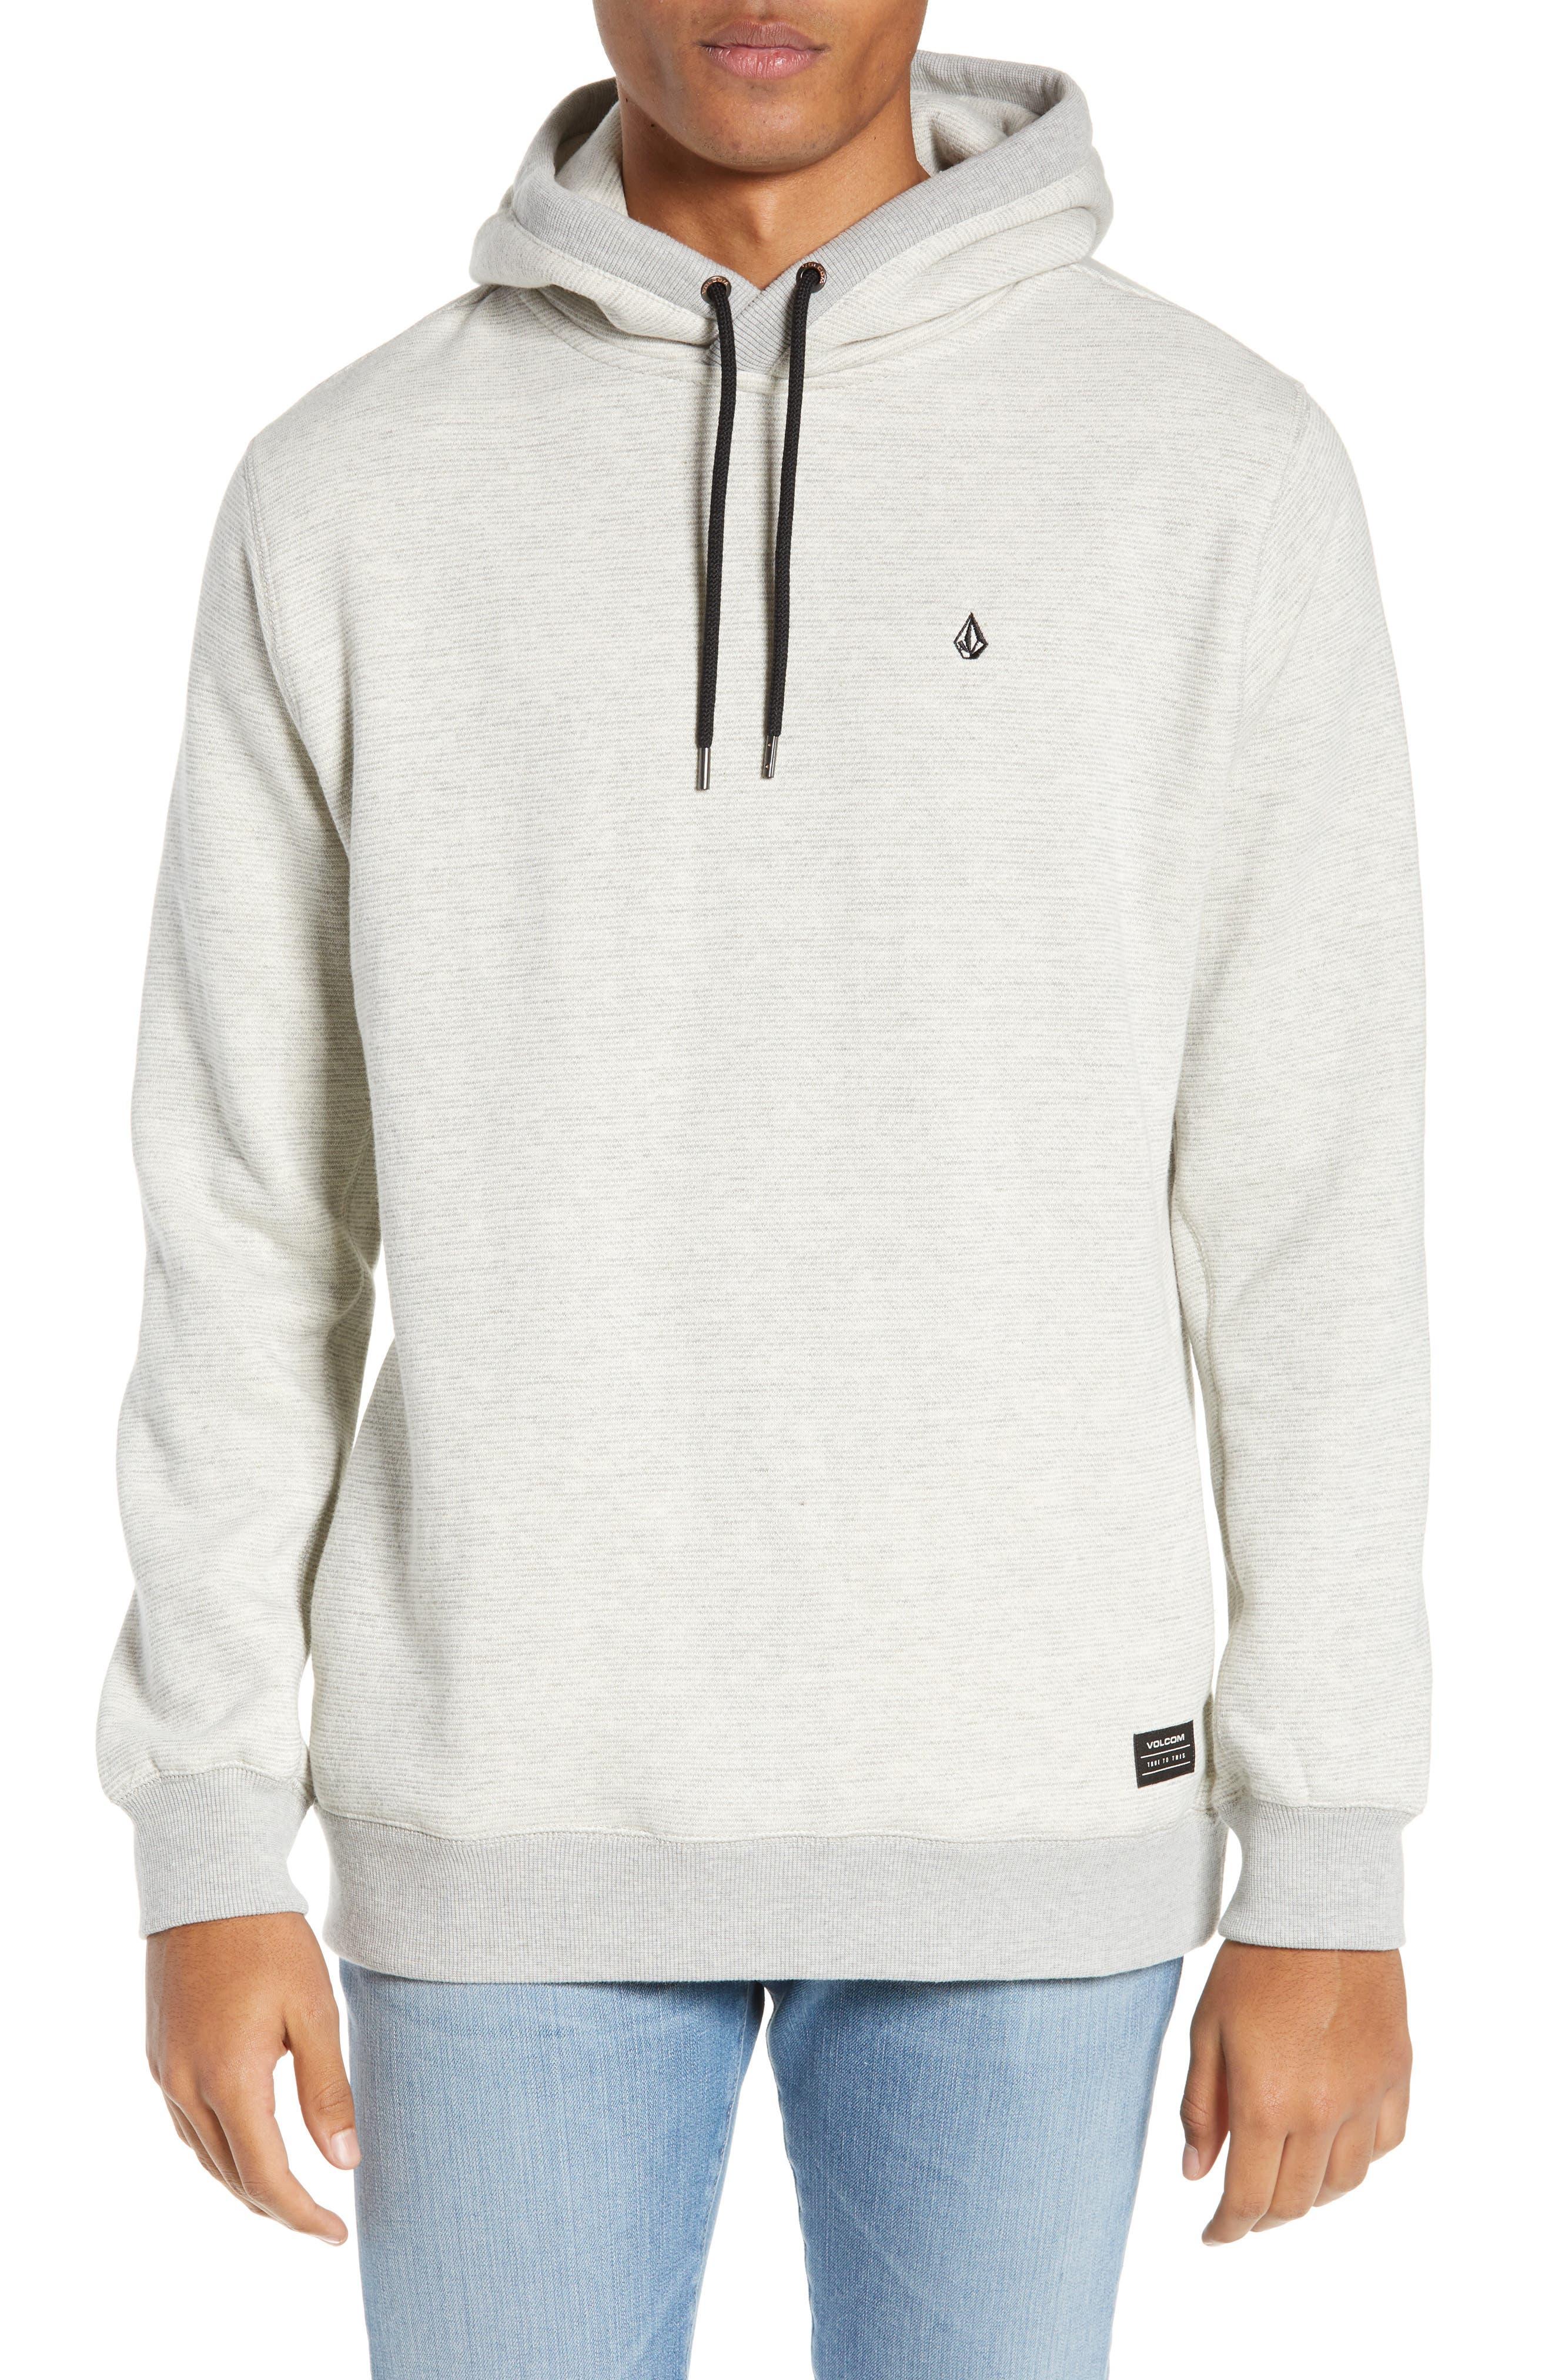 41f1e719c15 Men s Volcom Hoodies   Sweatshirts